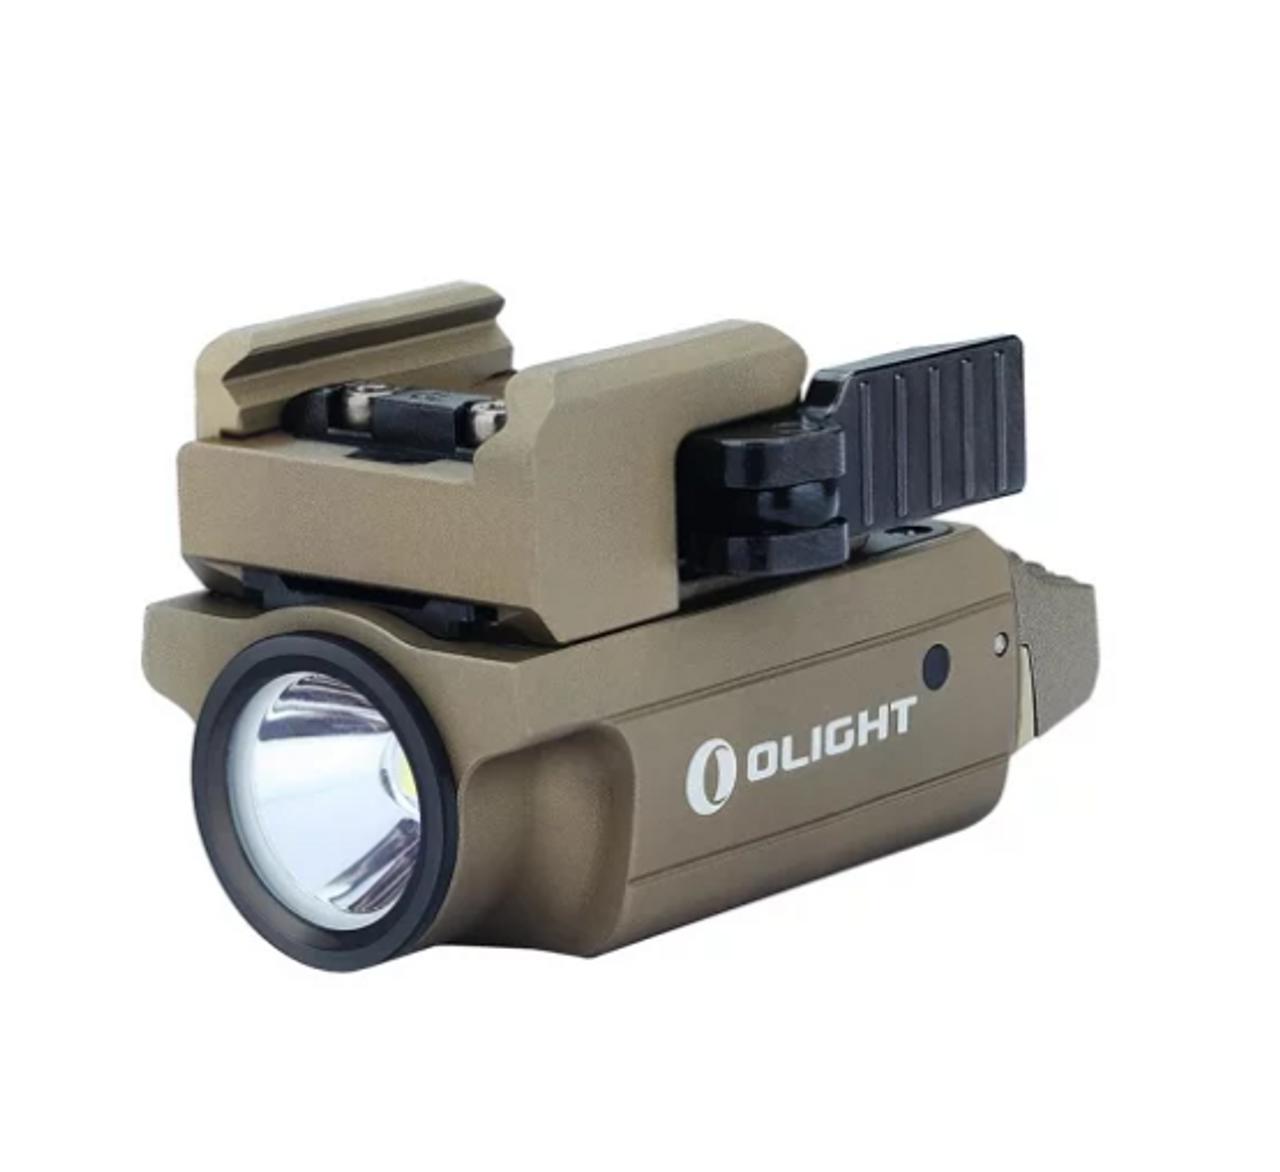 Olight PL-MINI 2 Valkyrie Desert Tan